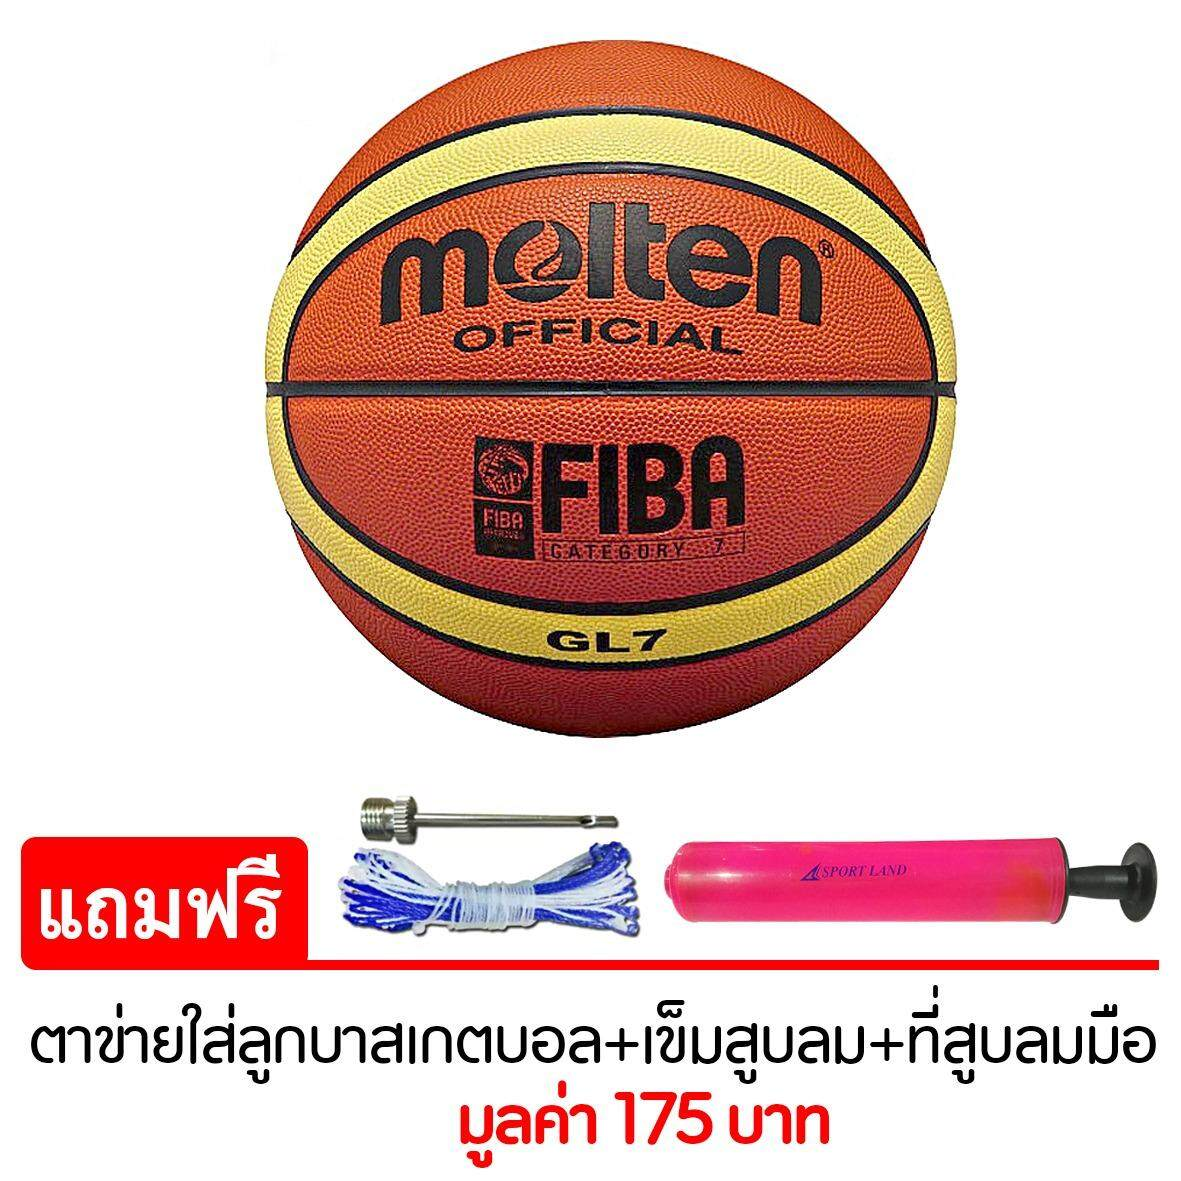 Molten Basketball LT MOT FIBA รุ่น BGL7 - สีส้ม แถมฟรี ตาข่ายใส่ลูกบาสเกตบอล + เข็มสูบสูบลม + สูบมือ SPL รุ่น SL6 สีชมพู